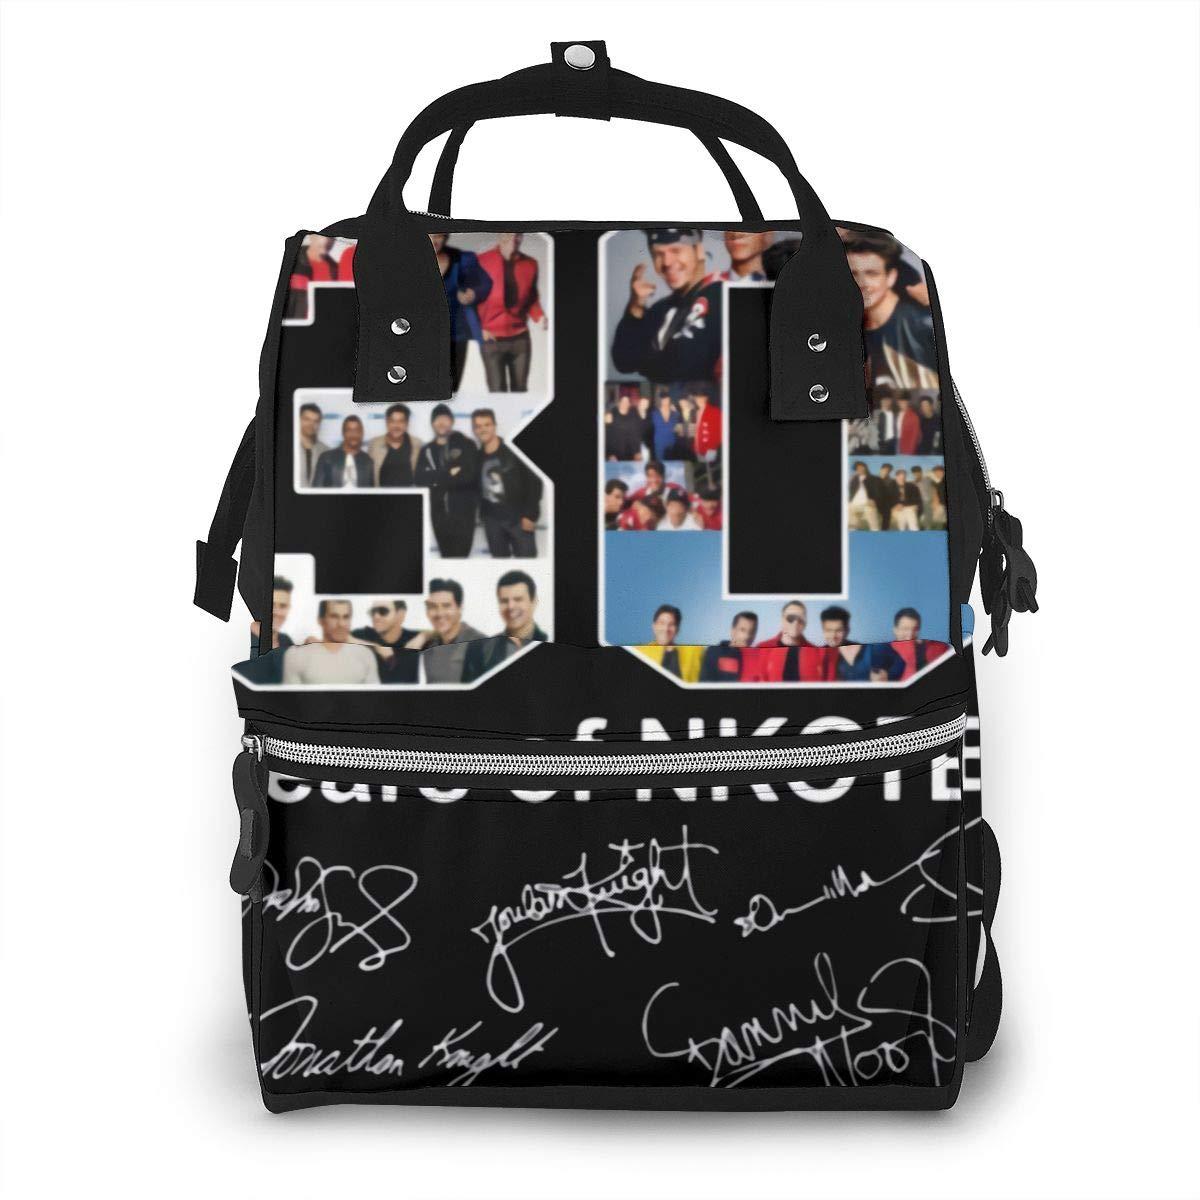 30 Years of New Kids On The Block NKOTB Durable, Large Capacity, Stylish, Adjustable Strap Length Mummy Backpack